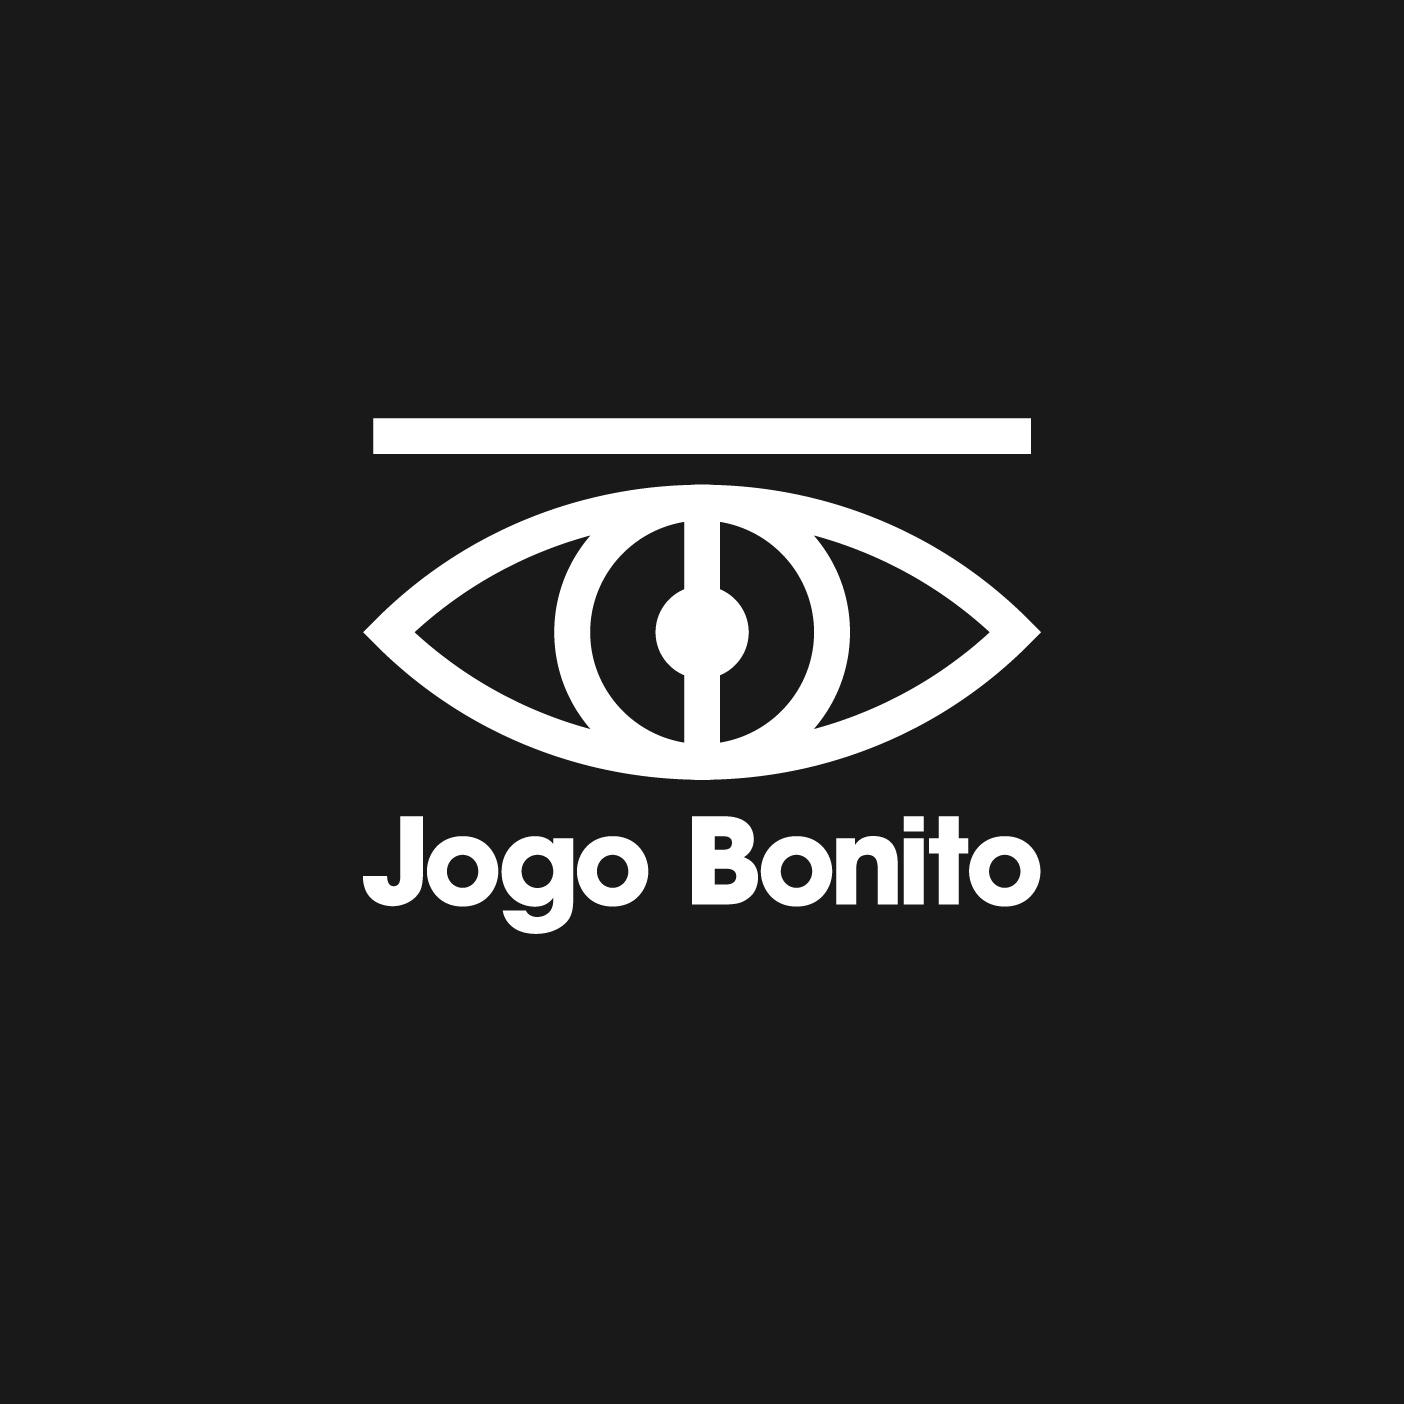 19.12.2020 Not John Obi Mikel